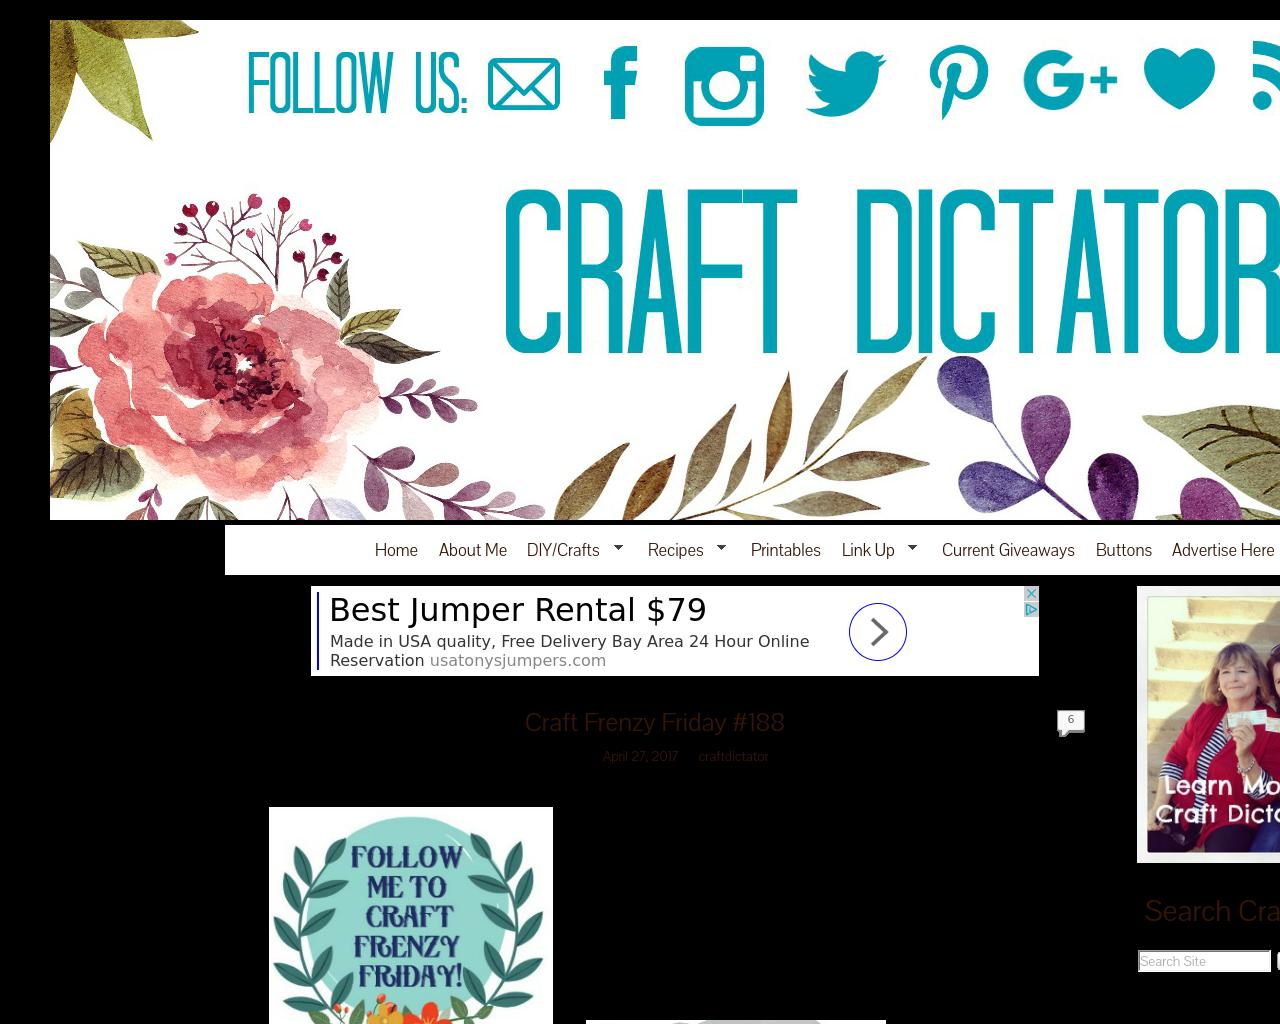 Craftdictator-Advertising-Reviews-Pricing